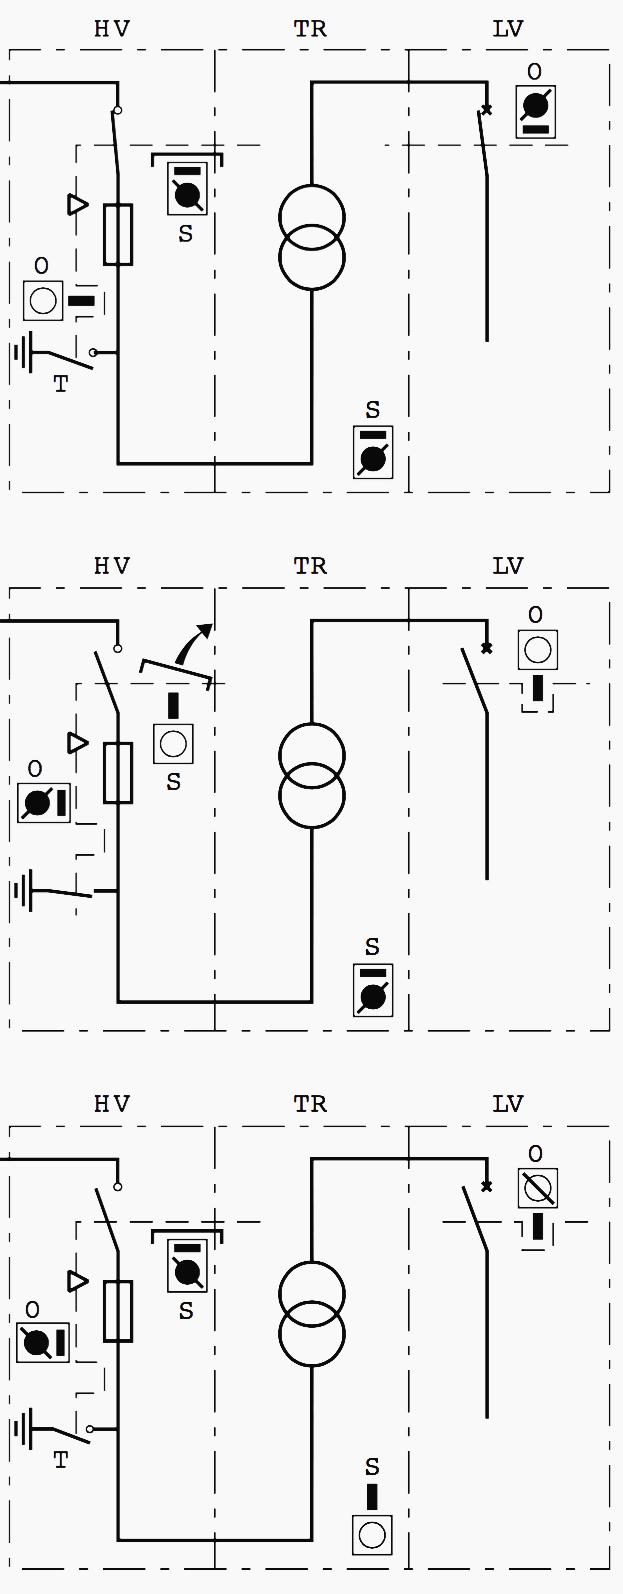 HV/TR/LV locking (functional symbols)